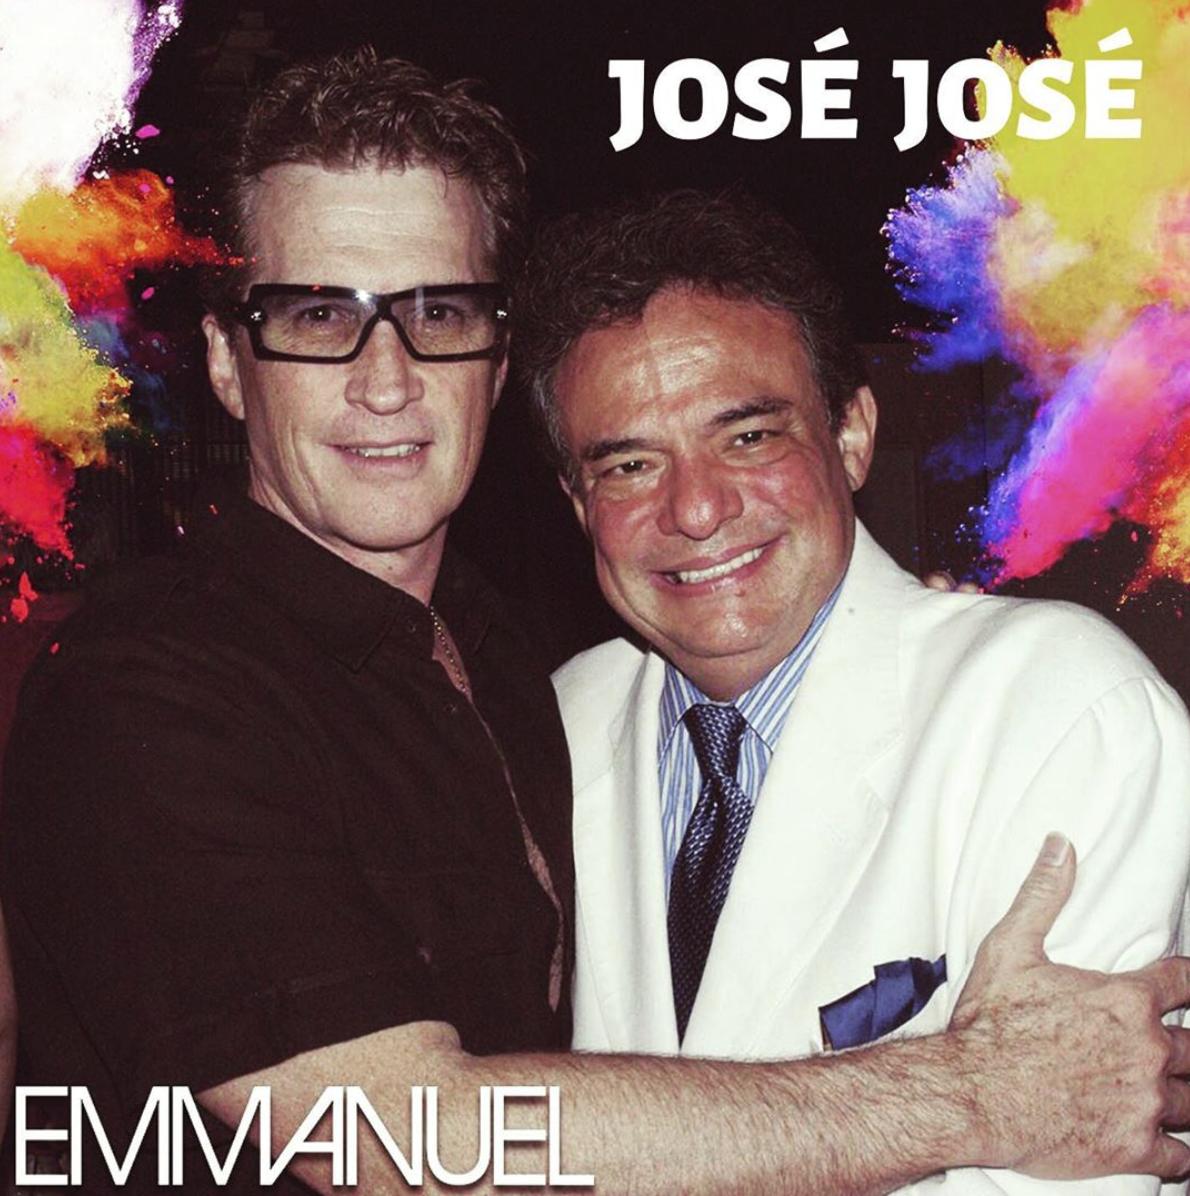 Emmanuel, José JOsé